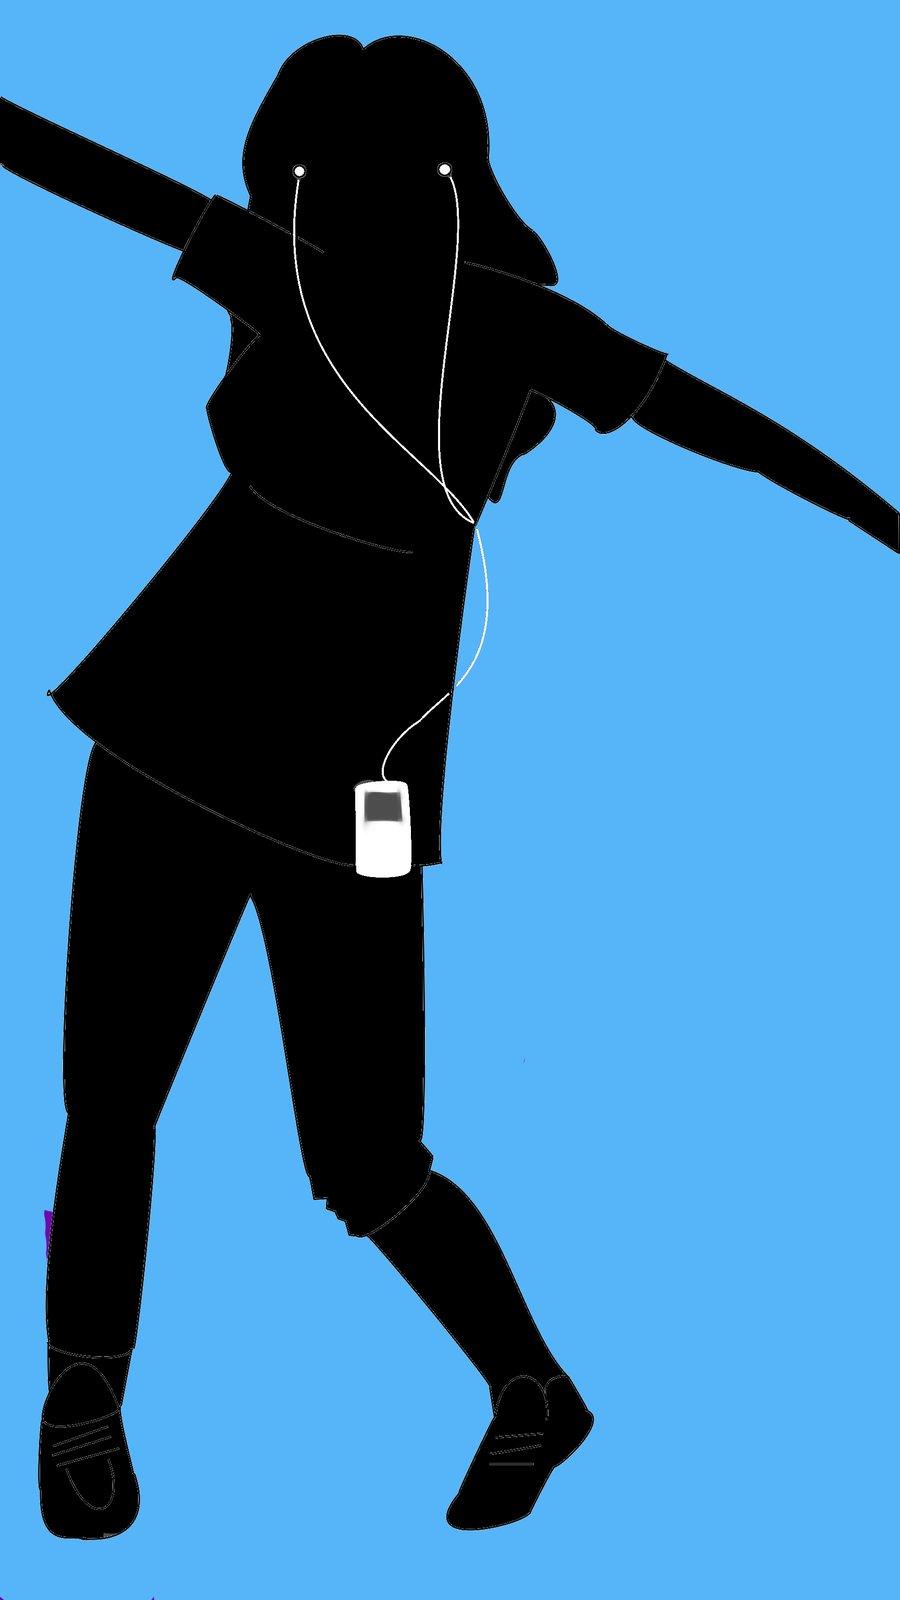 900x1600 Ipod Dance By Mschievous24